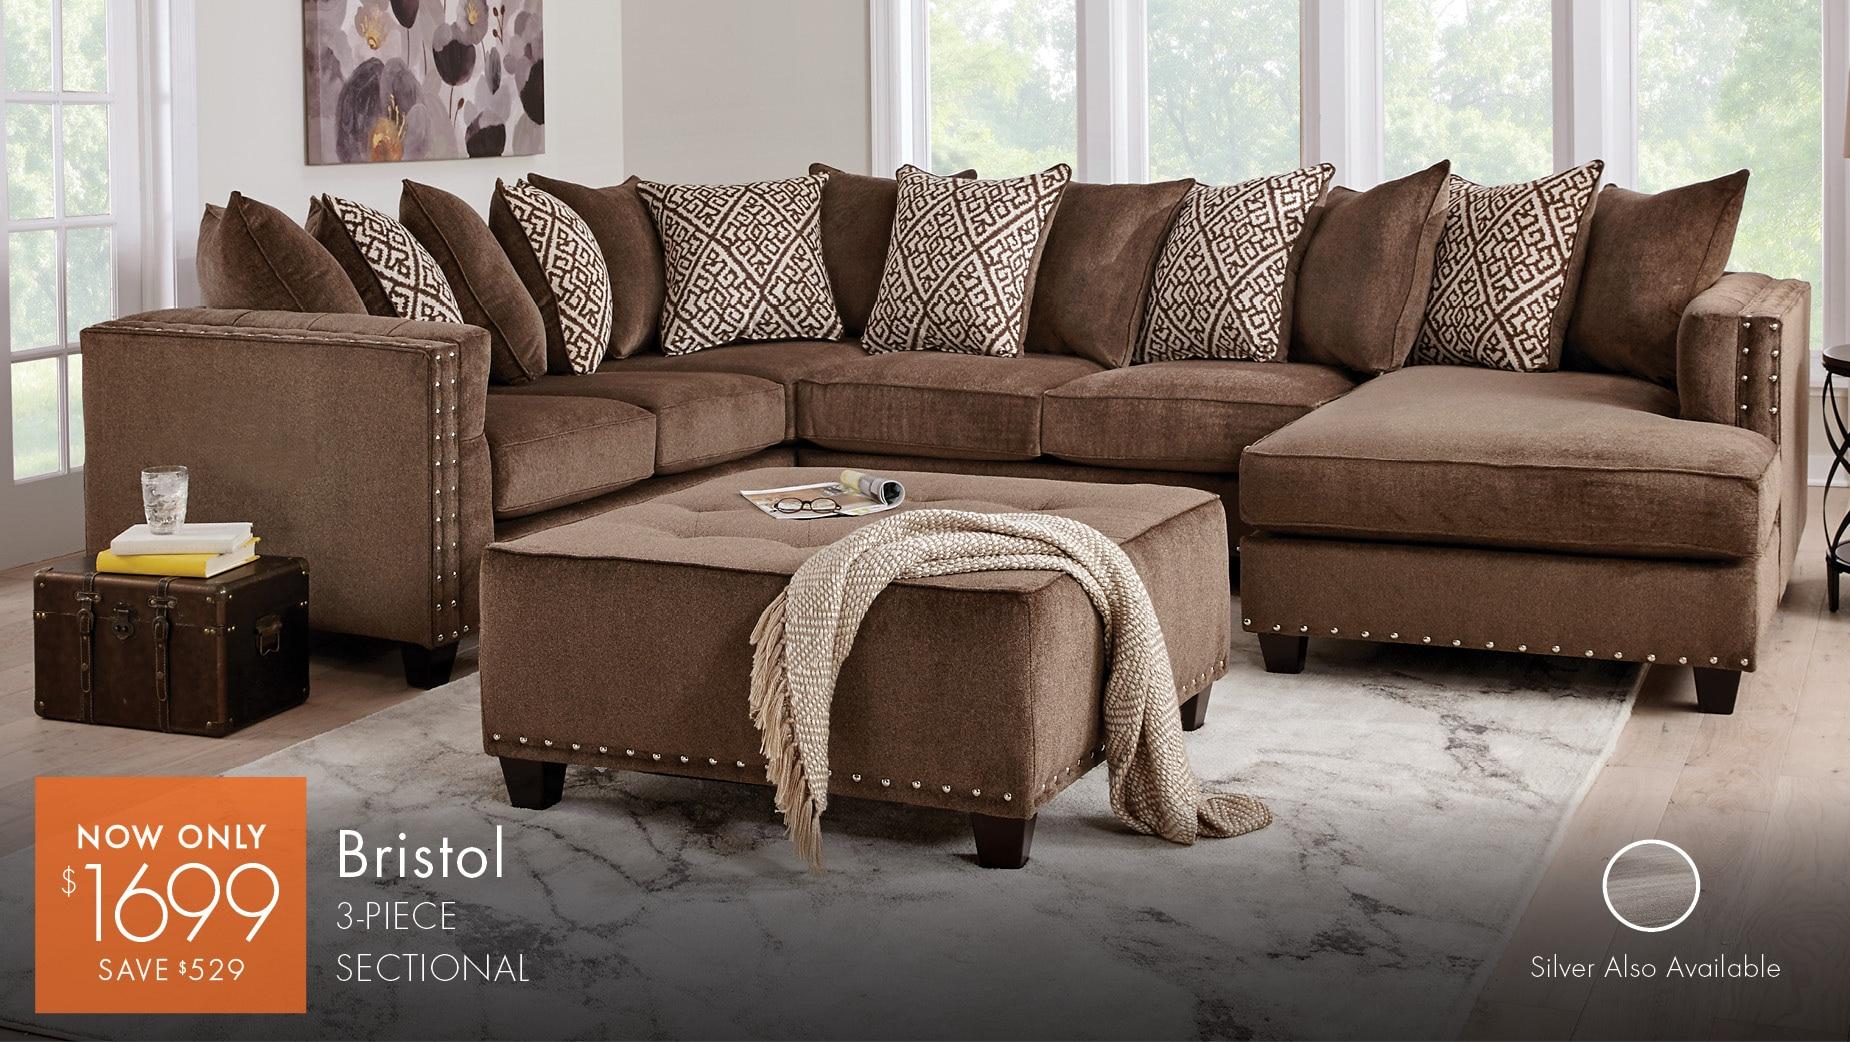 bristol sectional emilia 2 pc living room hillsboro queen set - Full Living Room Sets